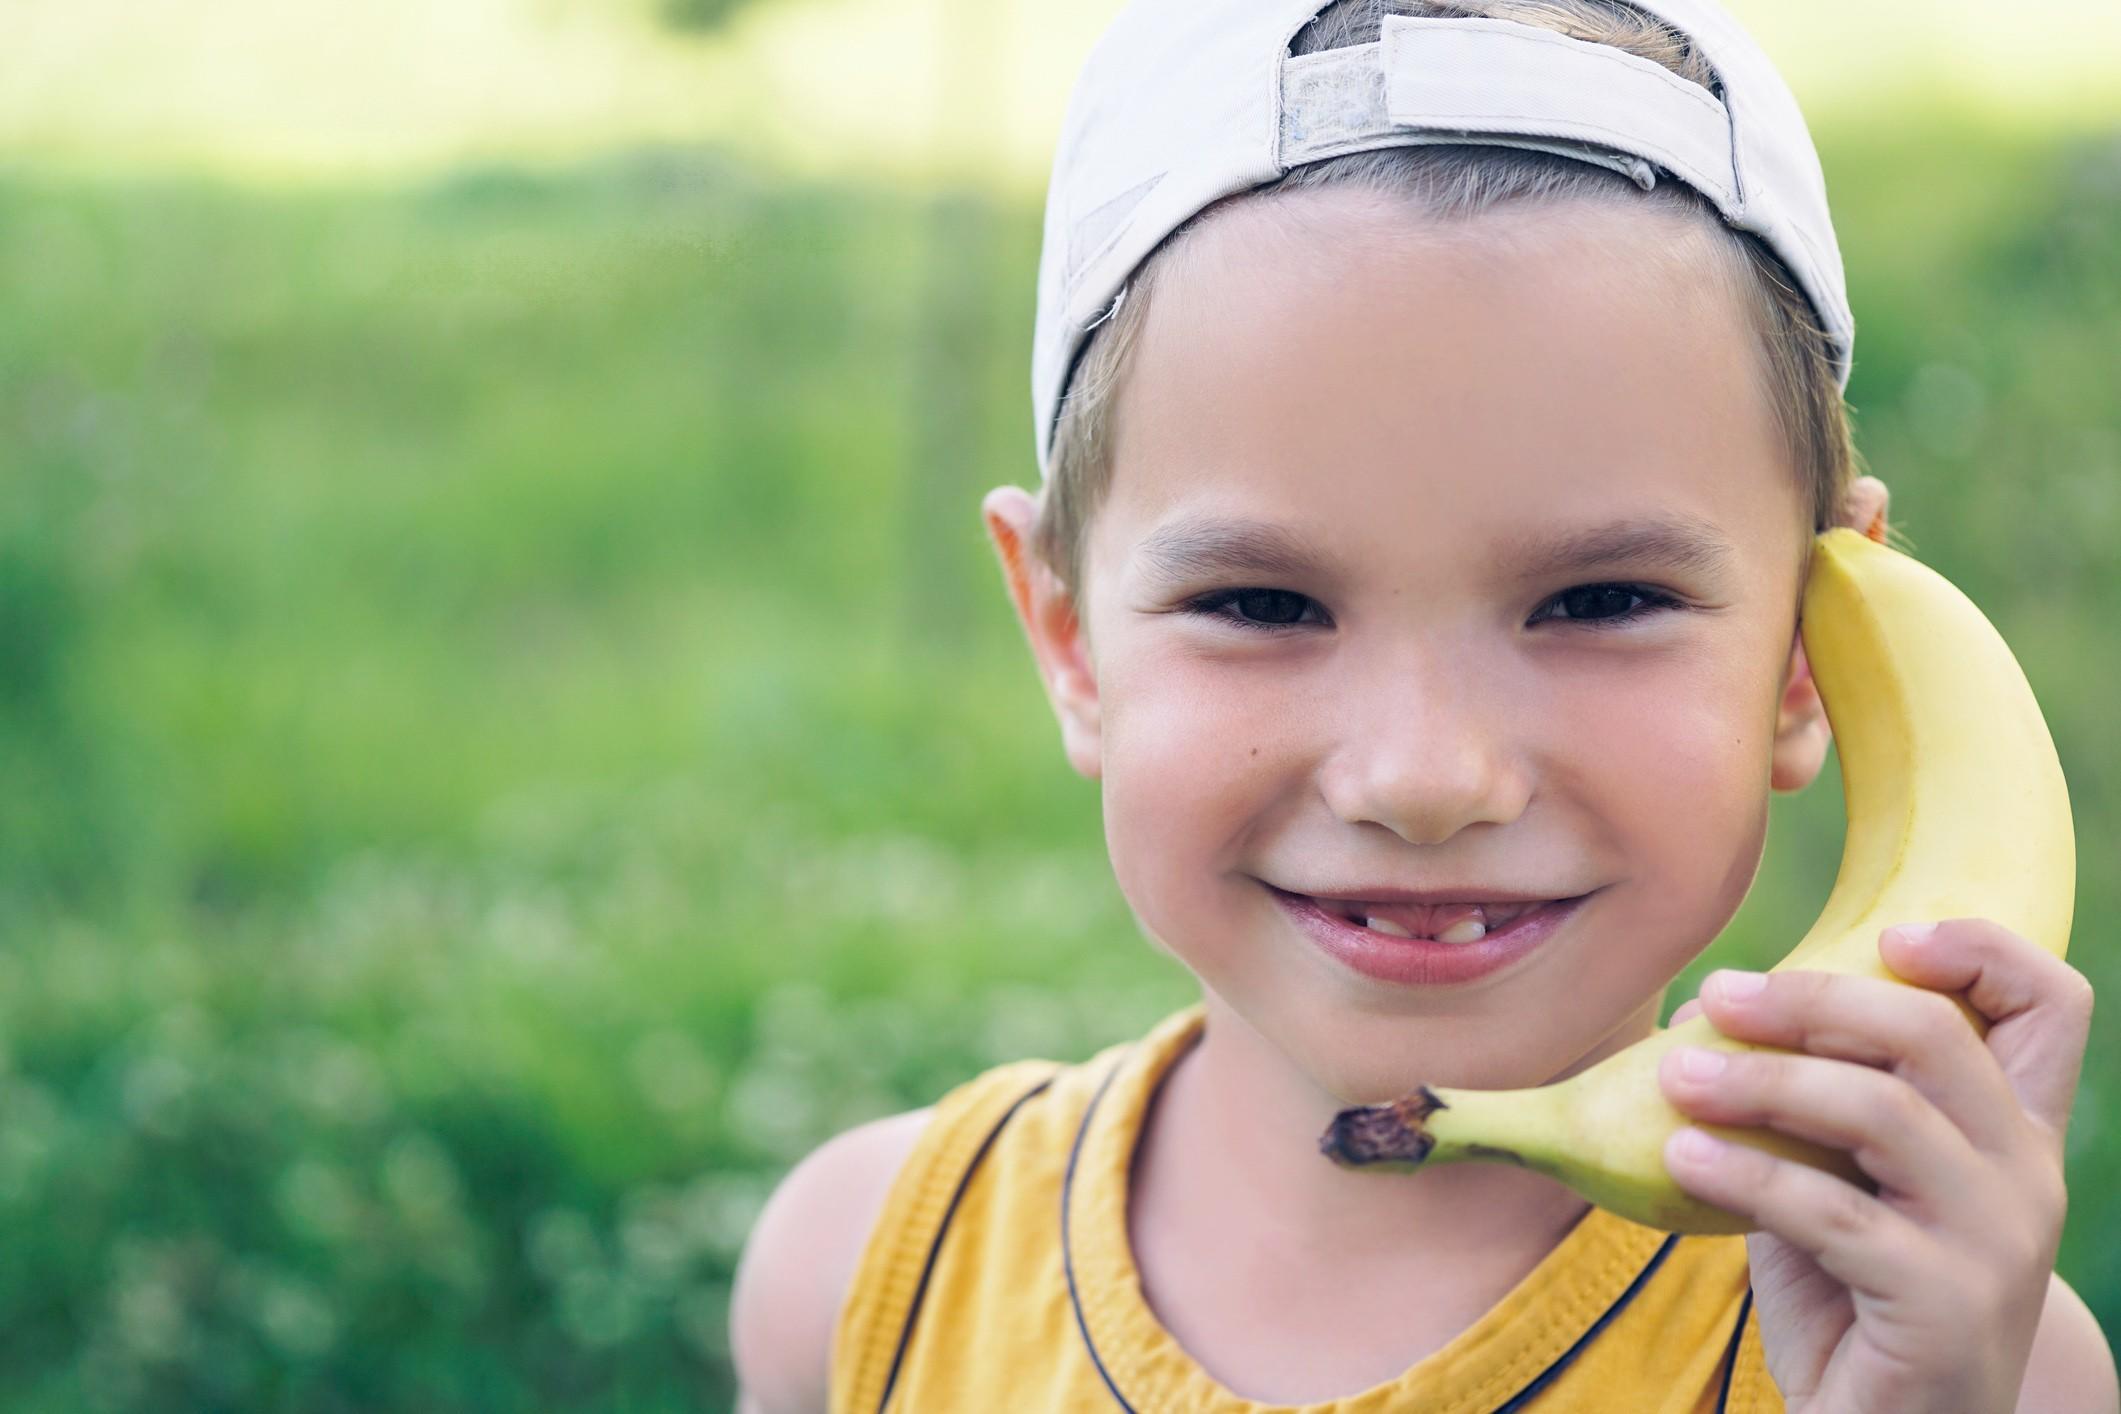 boy using banana as a telephone